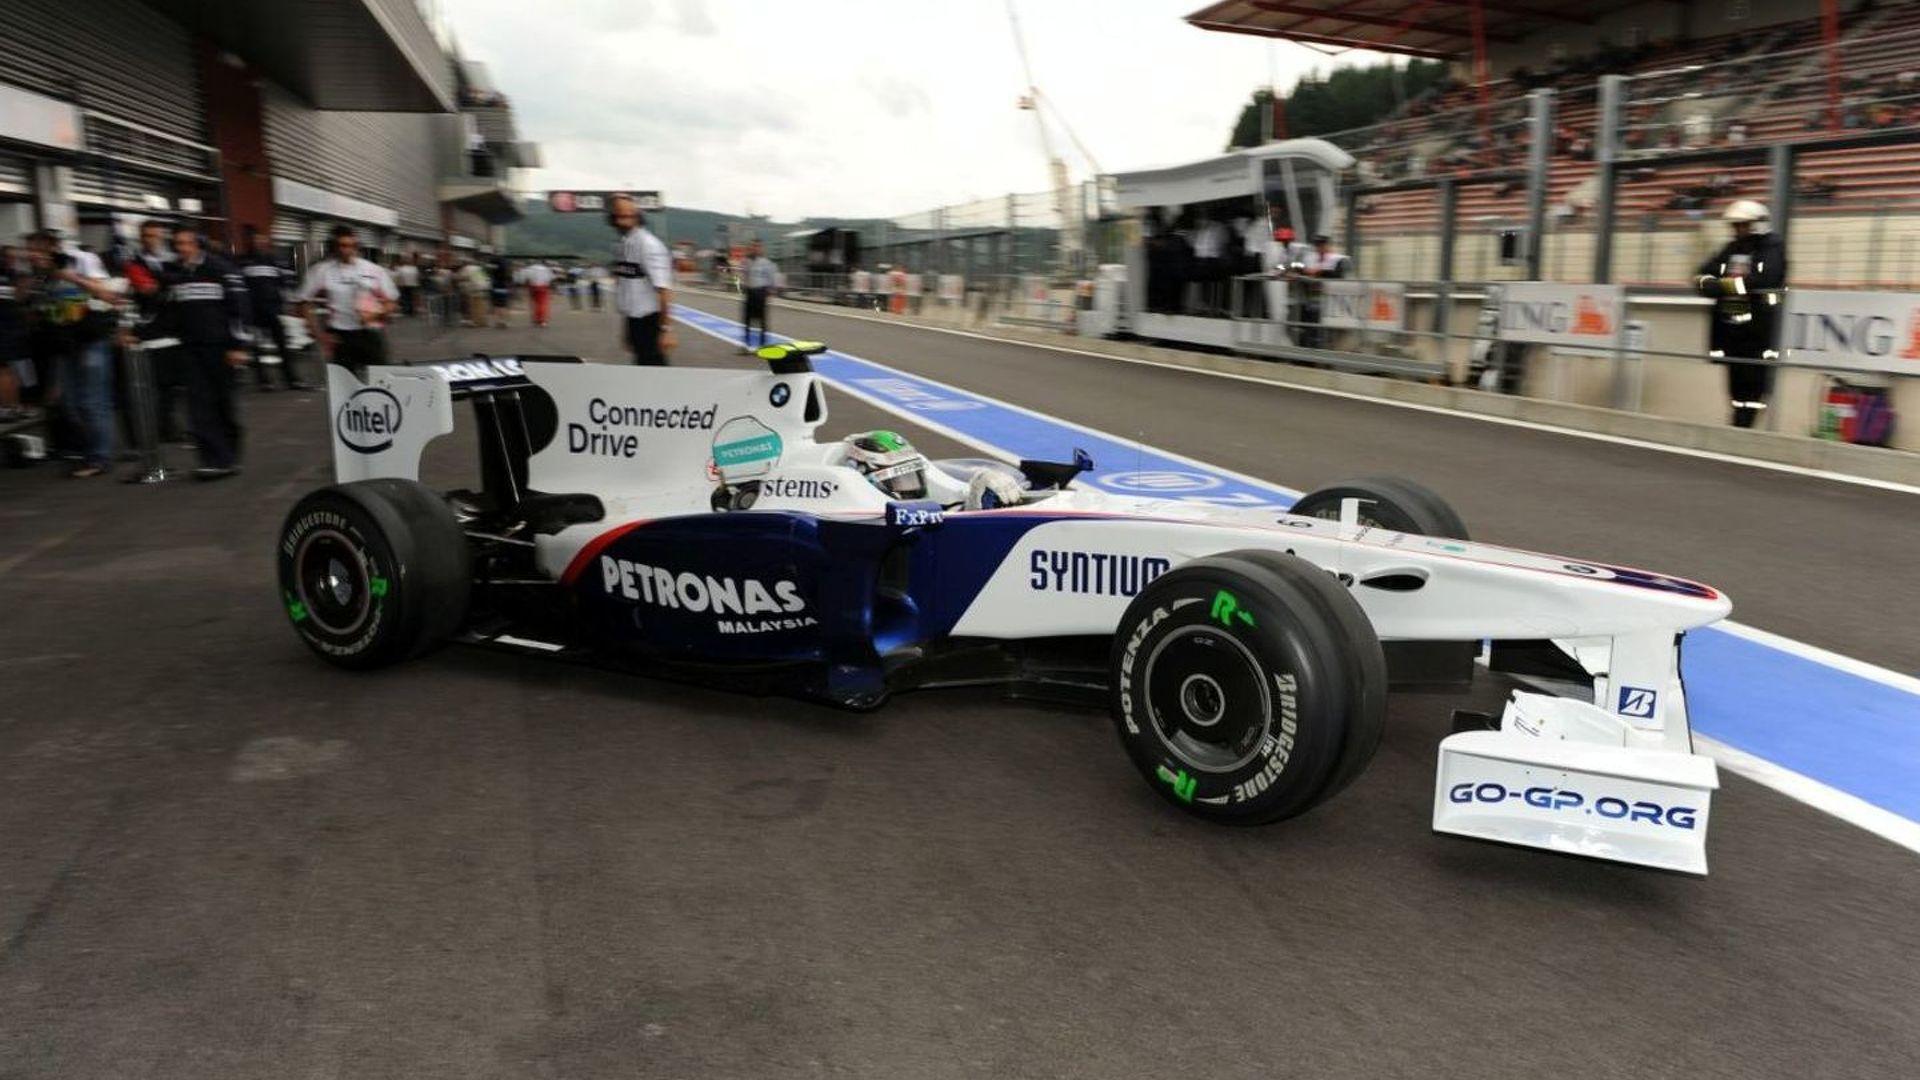 No Sauber team clarity for 'weeks' - Theissen